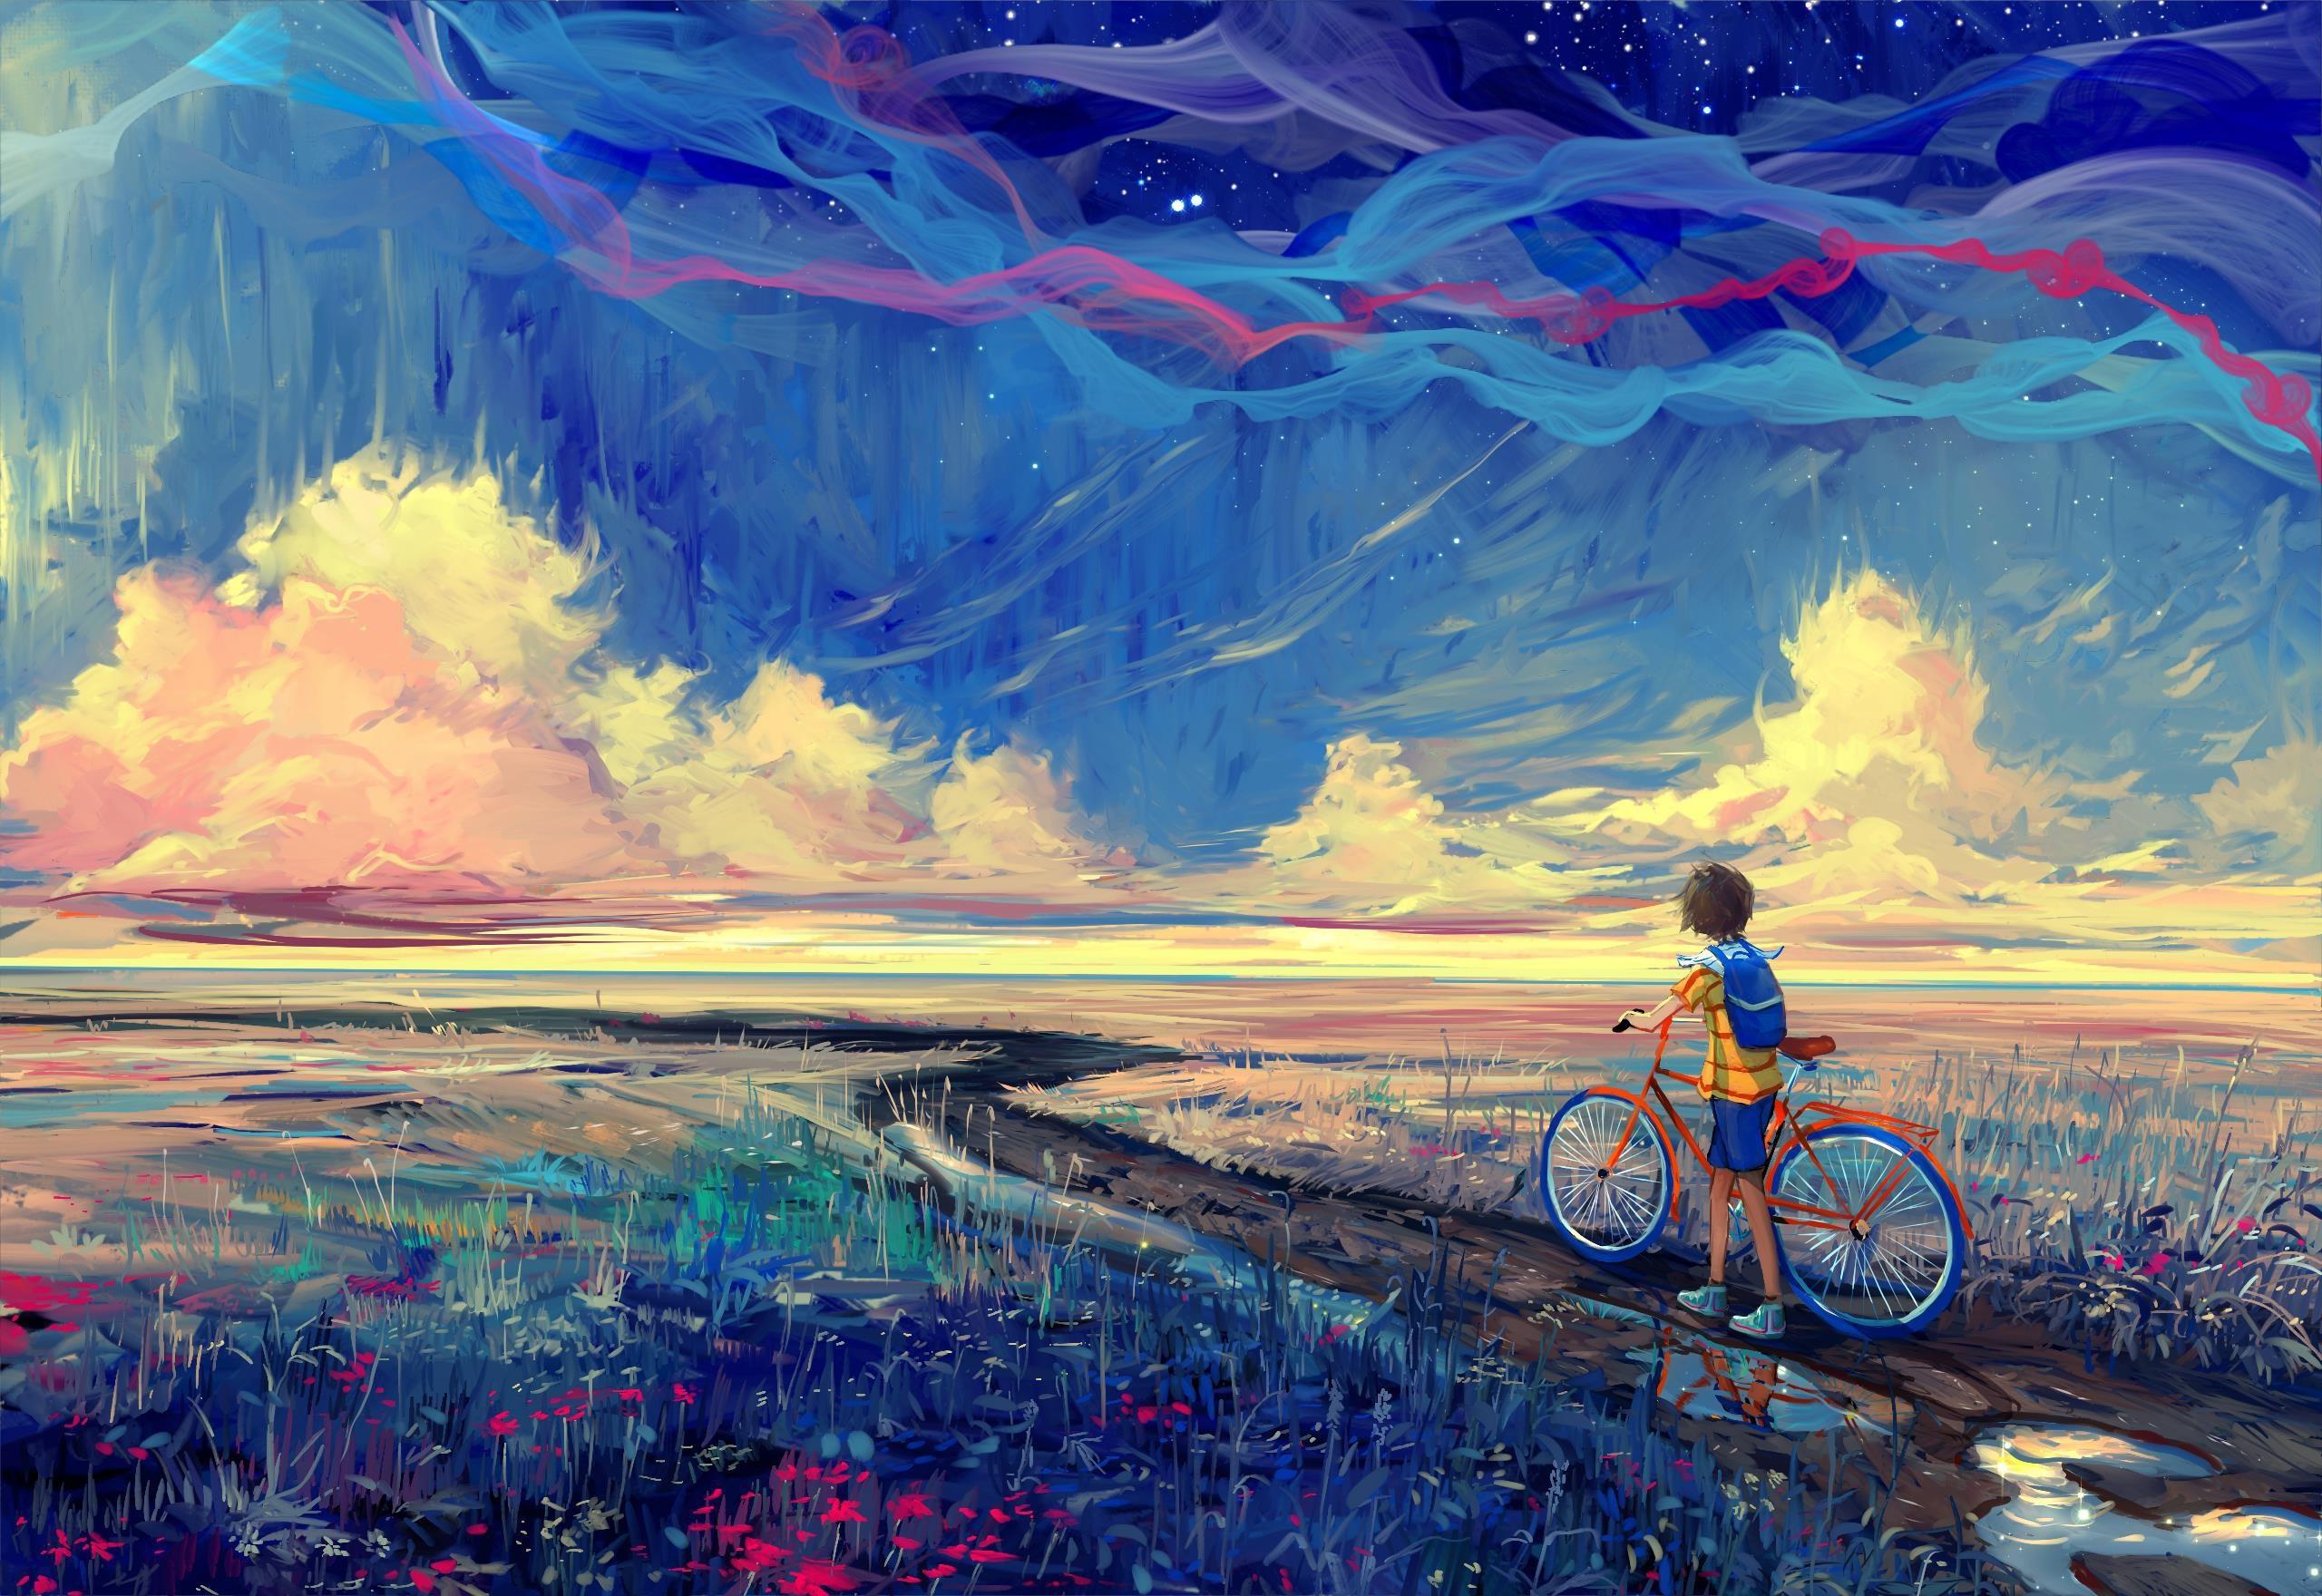 Wallpaper 2560x1760 px artwork bicycle fantasy art - Art wallpaper hd for mobile ...